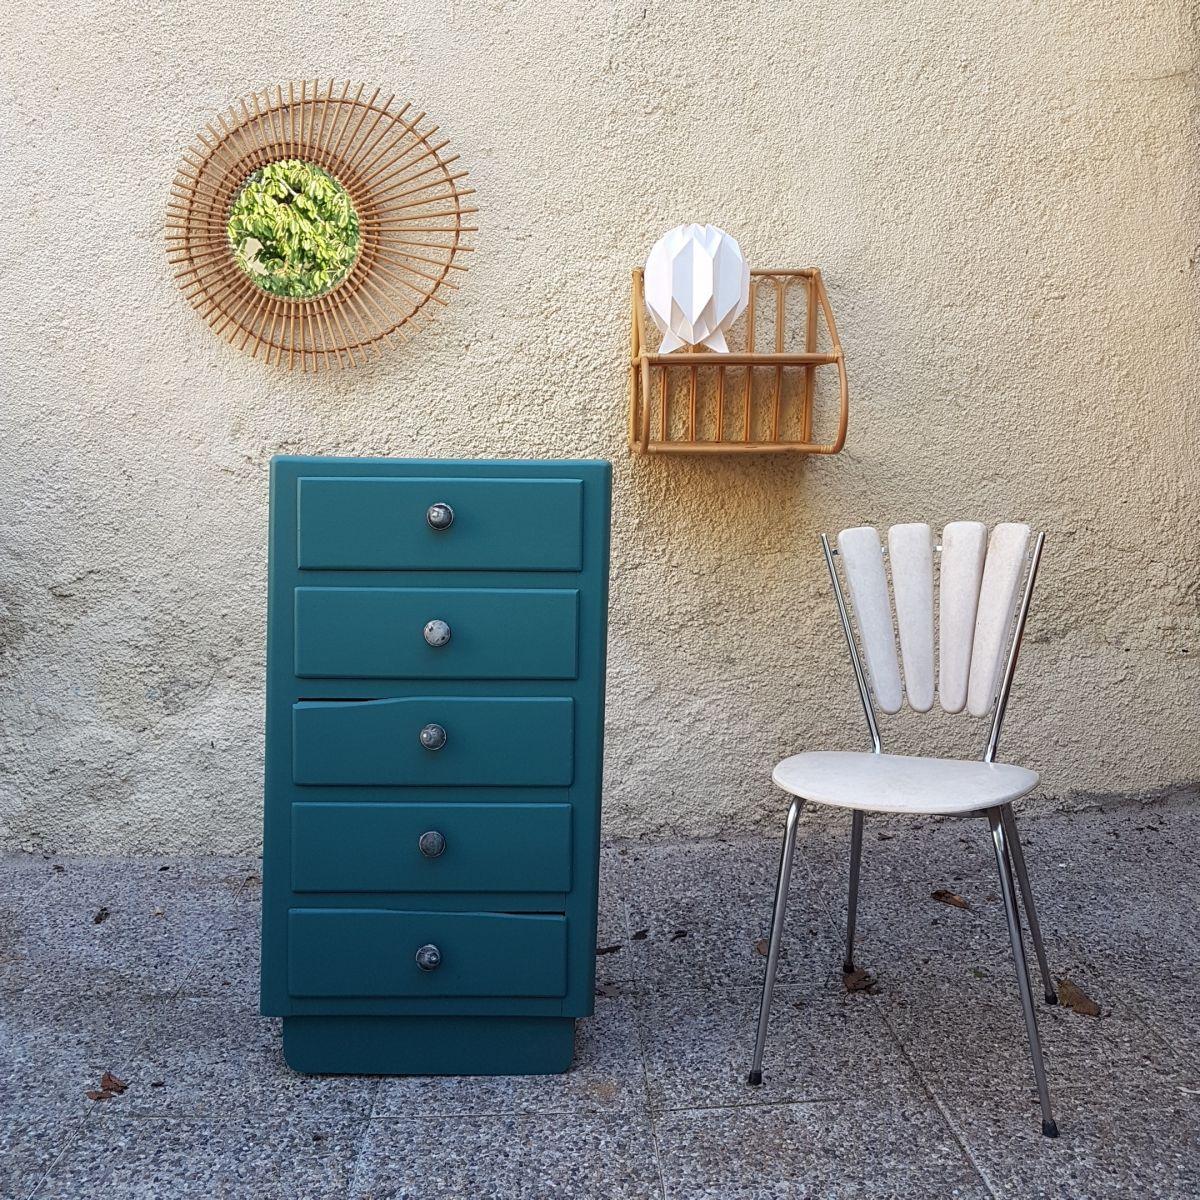 Chiffonnier En Bois Vintage Vert Emeraude Luckyfind Fr Chiffonnier Mobilier De Salon Meuble Vintage